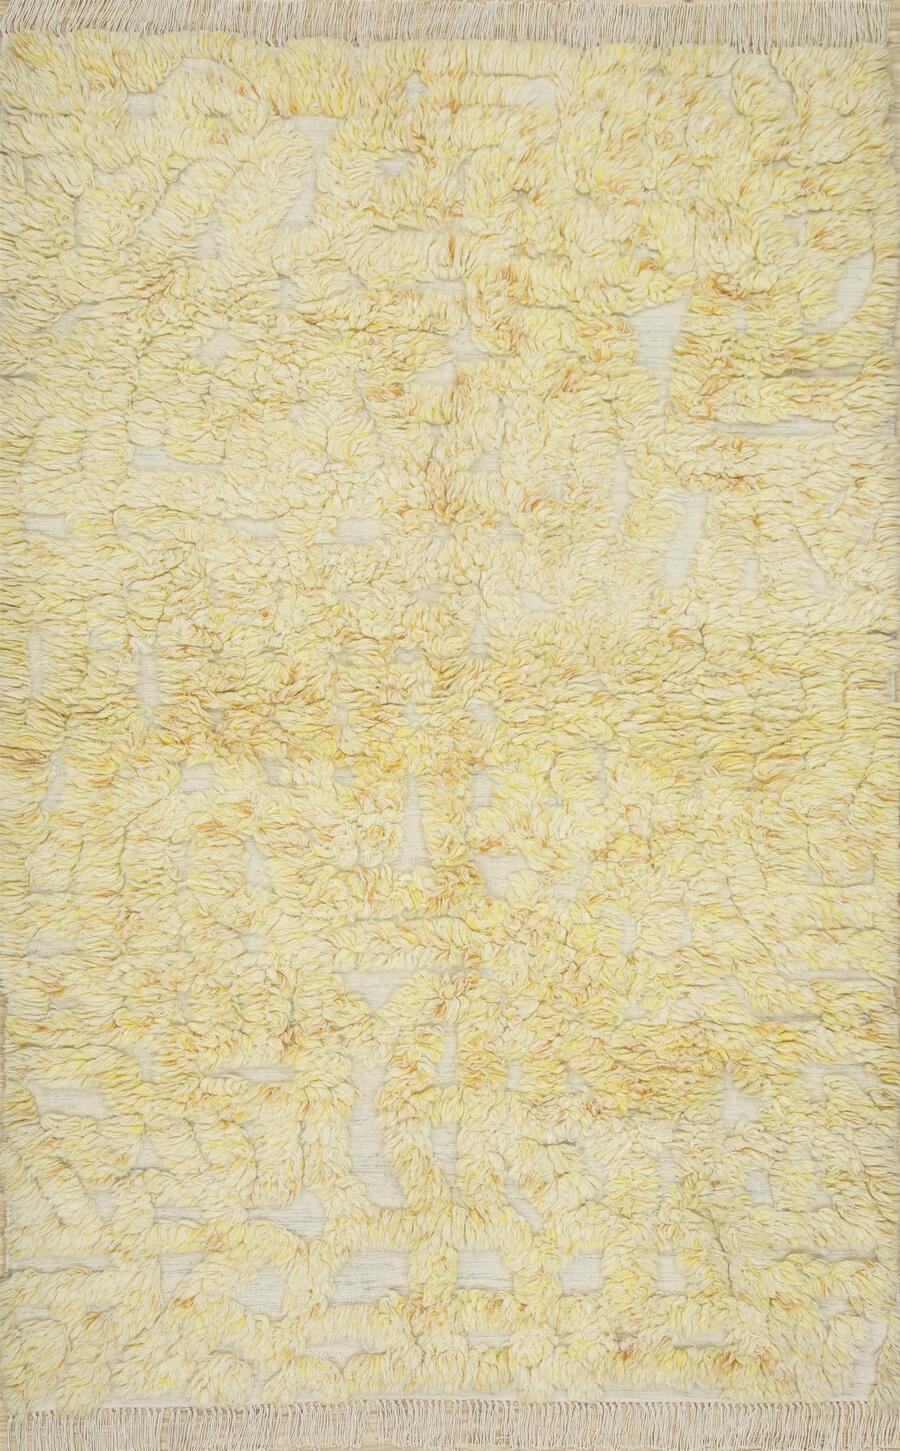 shag-rug-cleaning-method